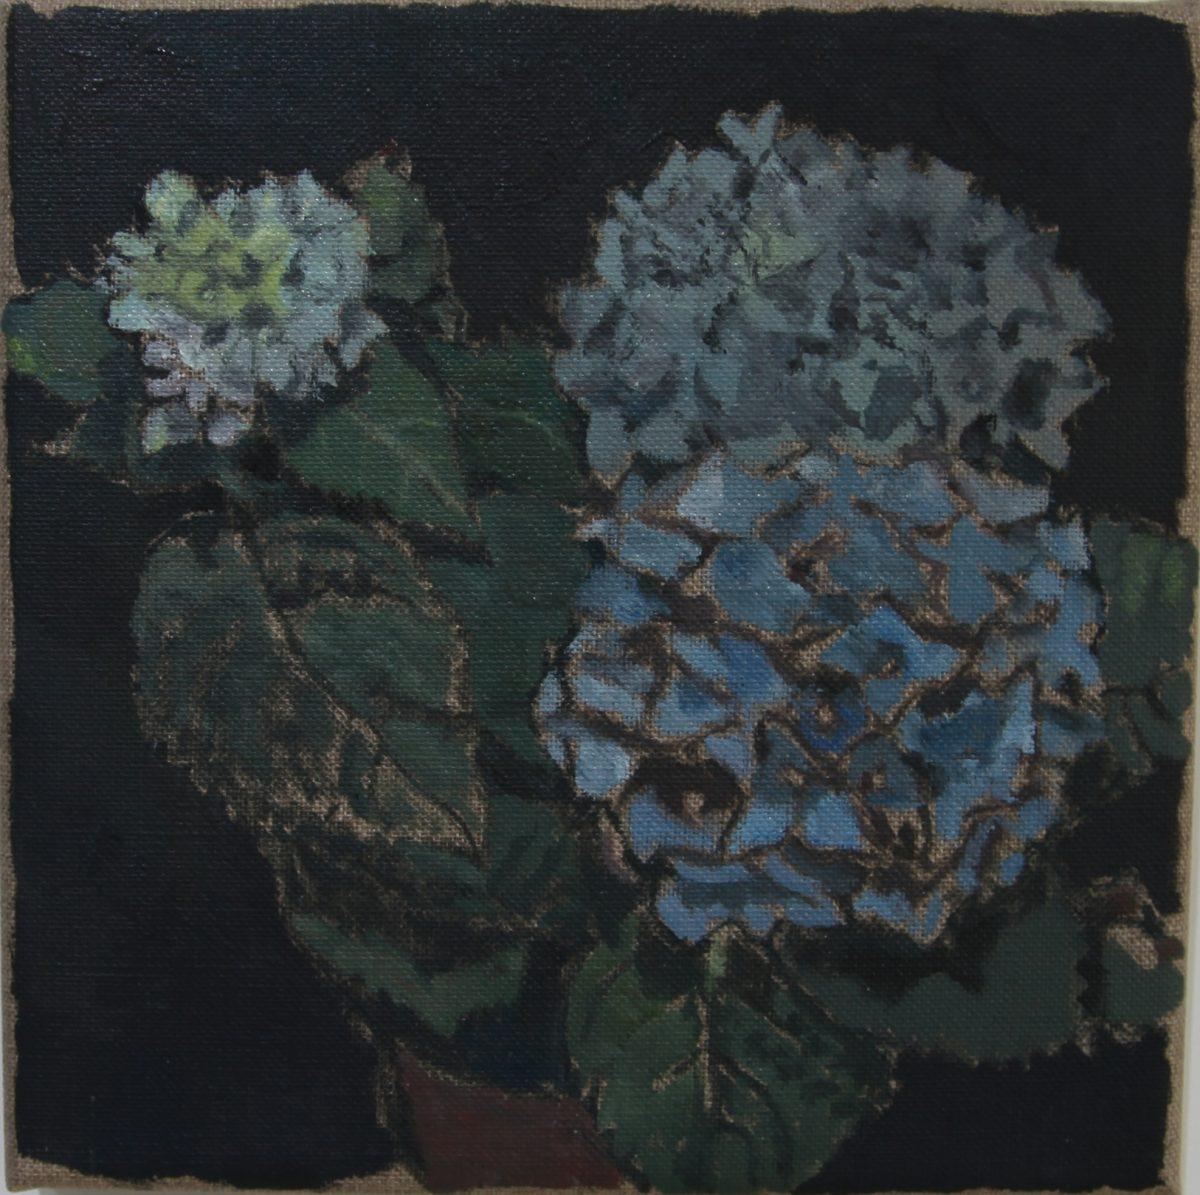 Hortensien 7, 2021, 20 x 20 cm